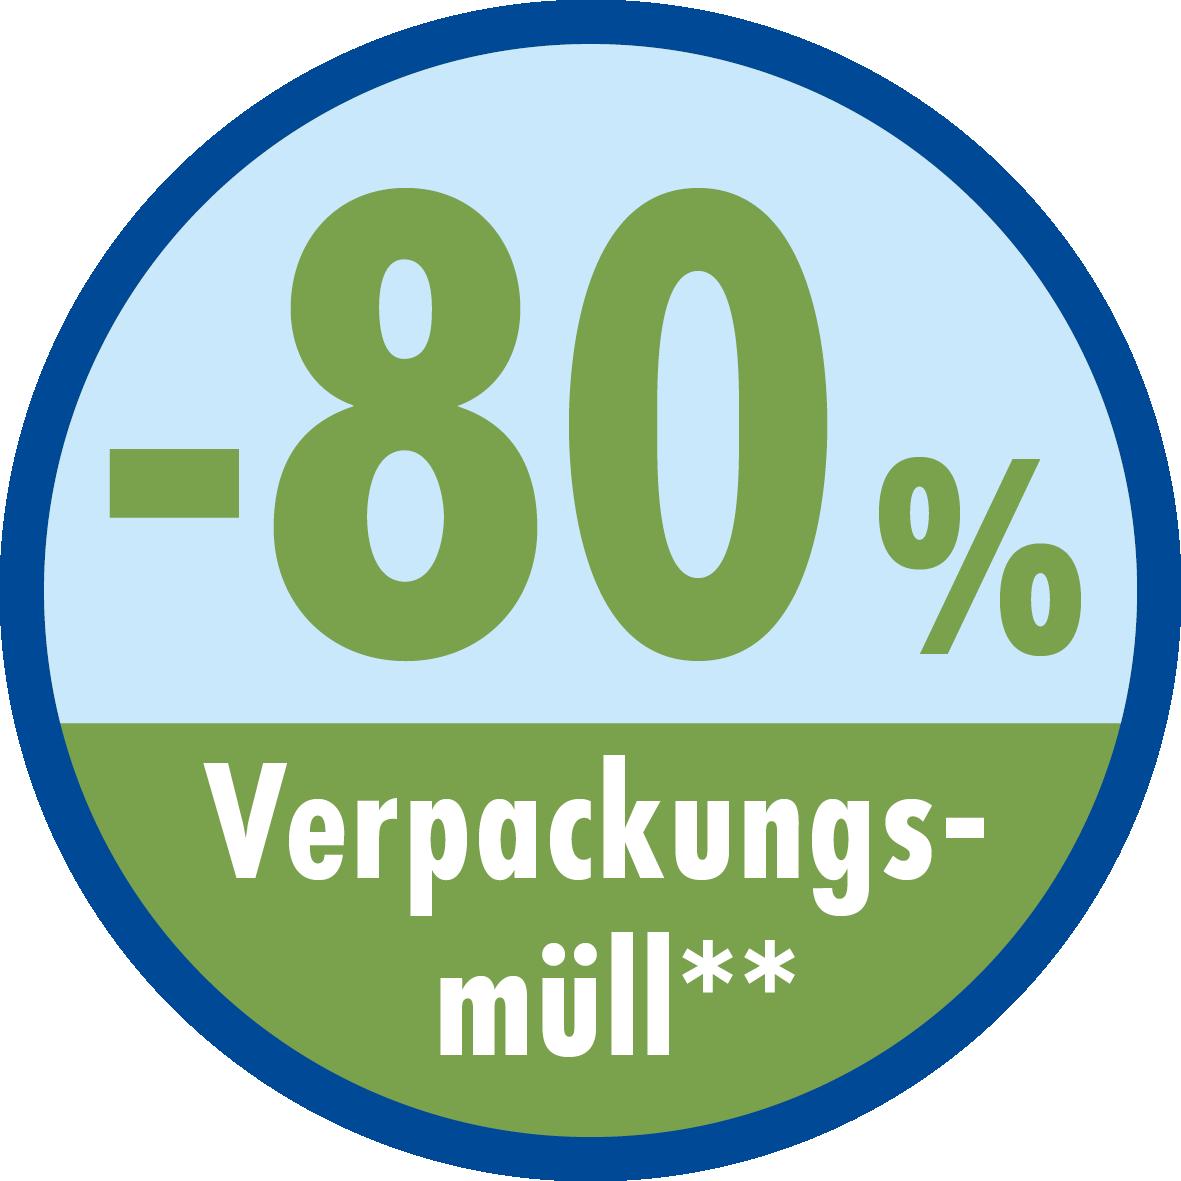 -80% verpakkingsafval